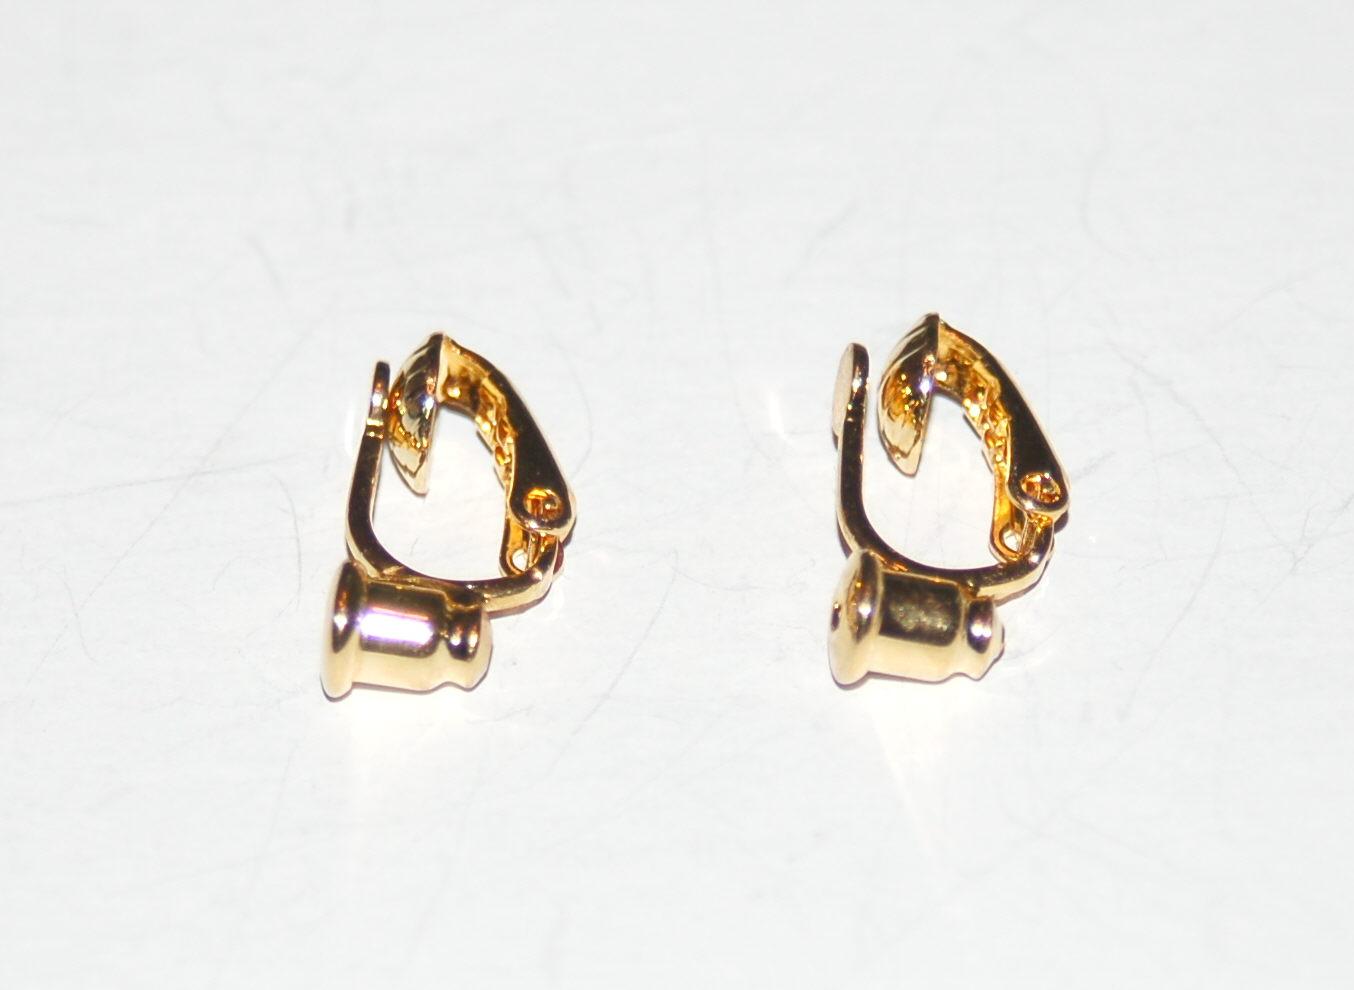 ceee69cbd Earring Converters - Mini Clip - 2 pairs - Luc-Co, Inc.